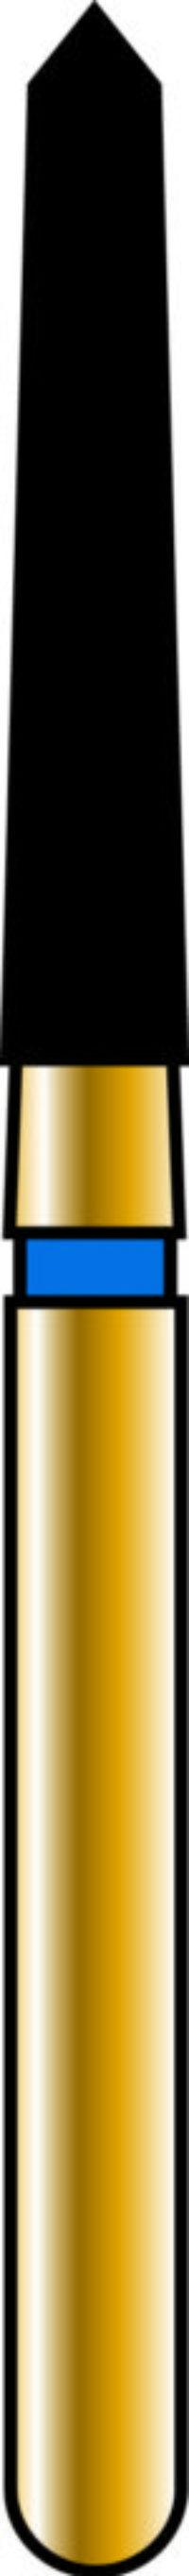 Pointed Taper 18-9.5mm Gold Diamond Bur - Coarse Grit